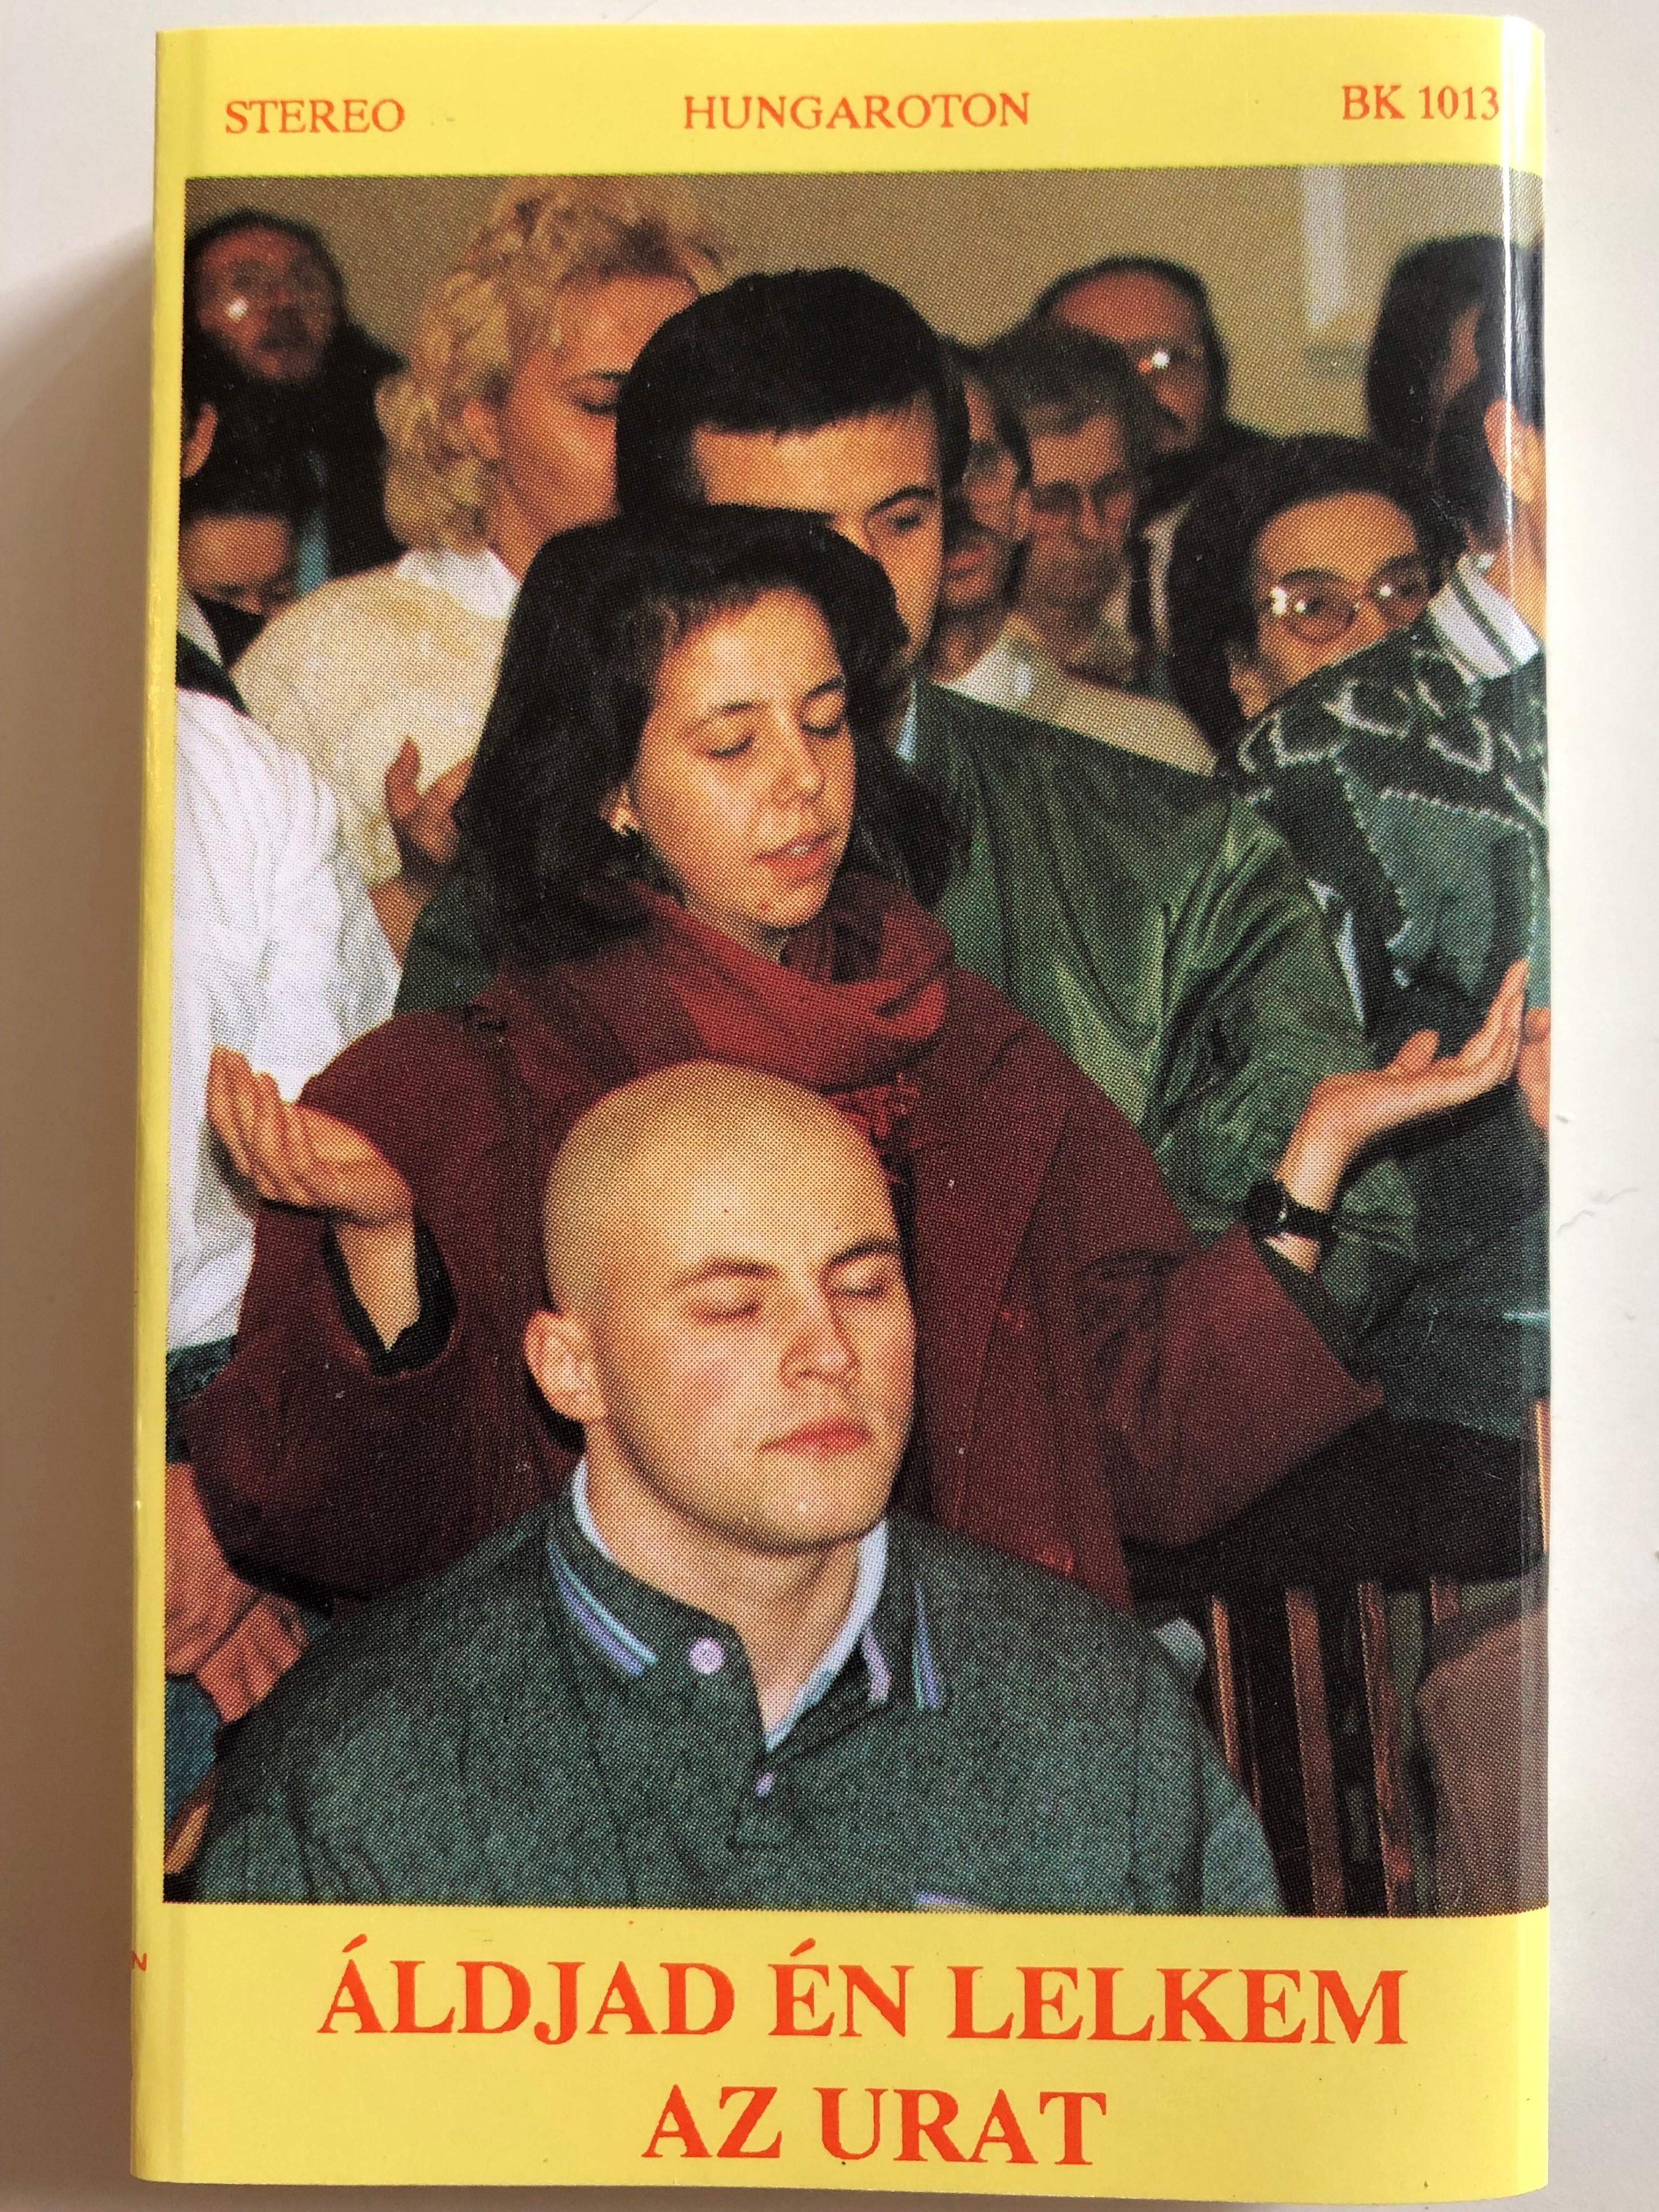 -ldjad-n-lelkem-az-urat-emmausz-katolikus-karizmatikus-k-z-ss-g-nek-s-zenekara-hungaroton-cassette-stereo-bk-1013-1-.jpg